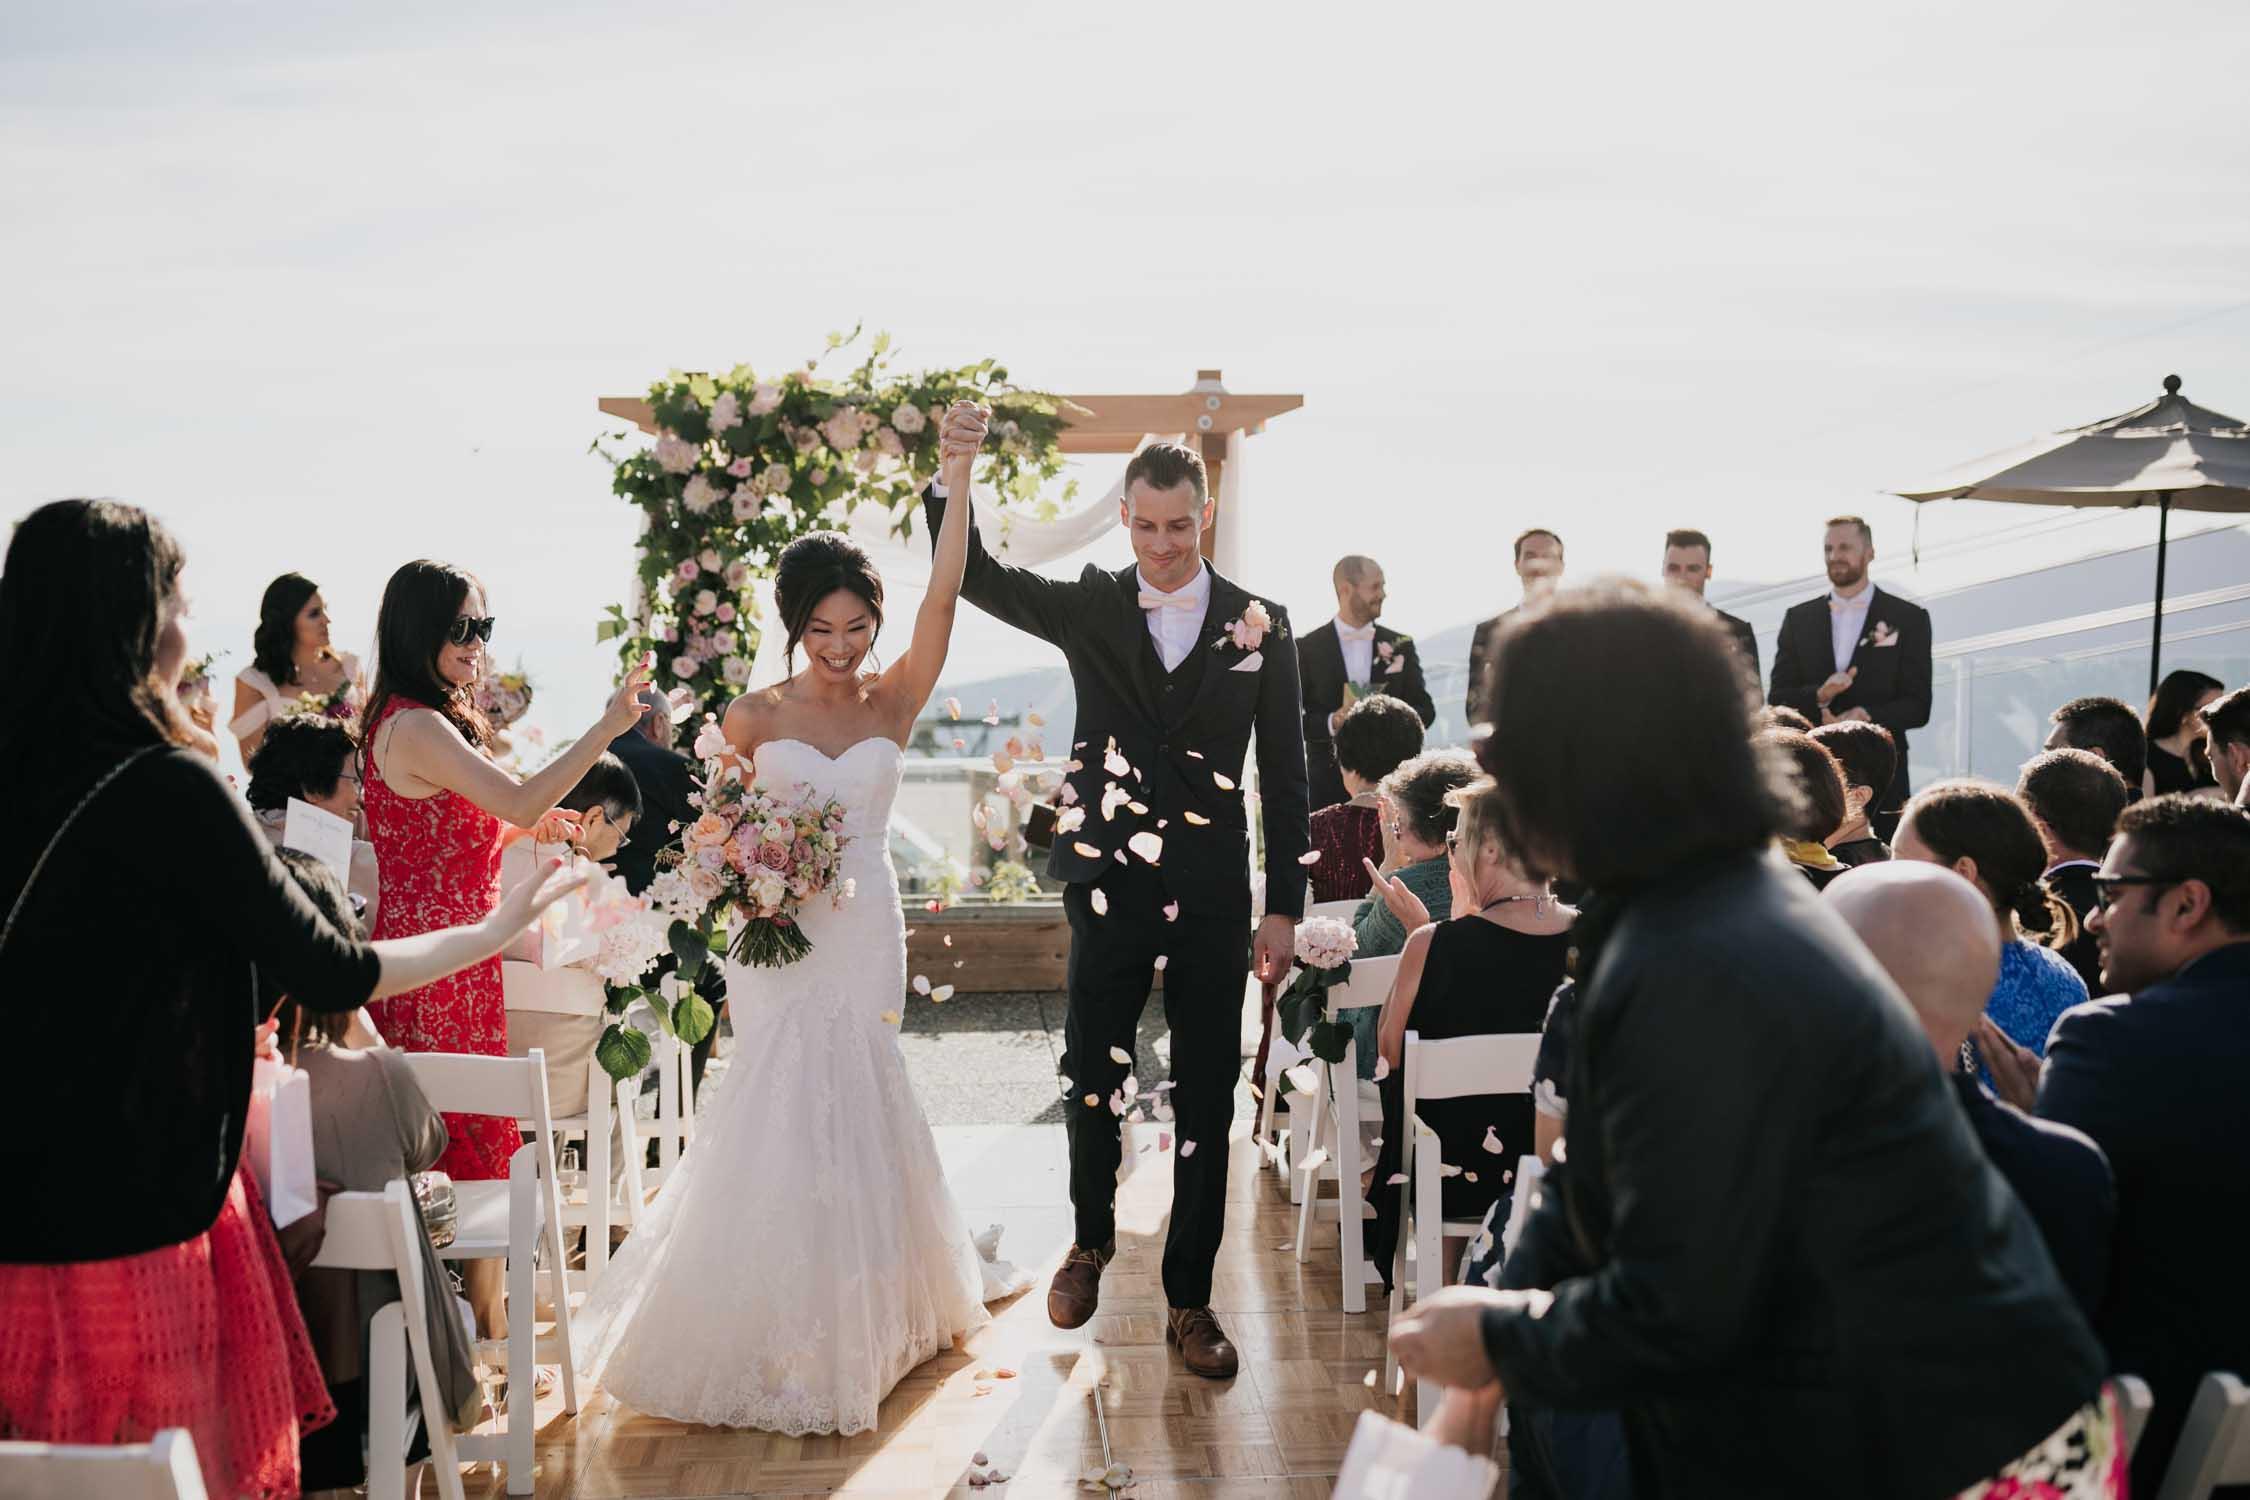 Altitudes Bistro Grouse Mountain Wedding Ceremony Confetti Throw Rose Petals